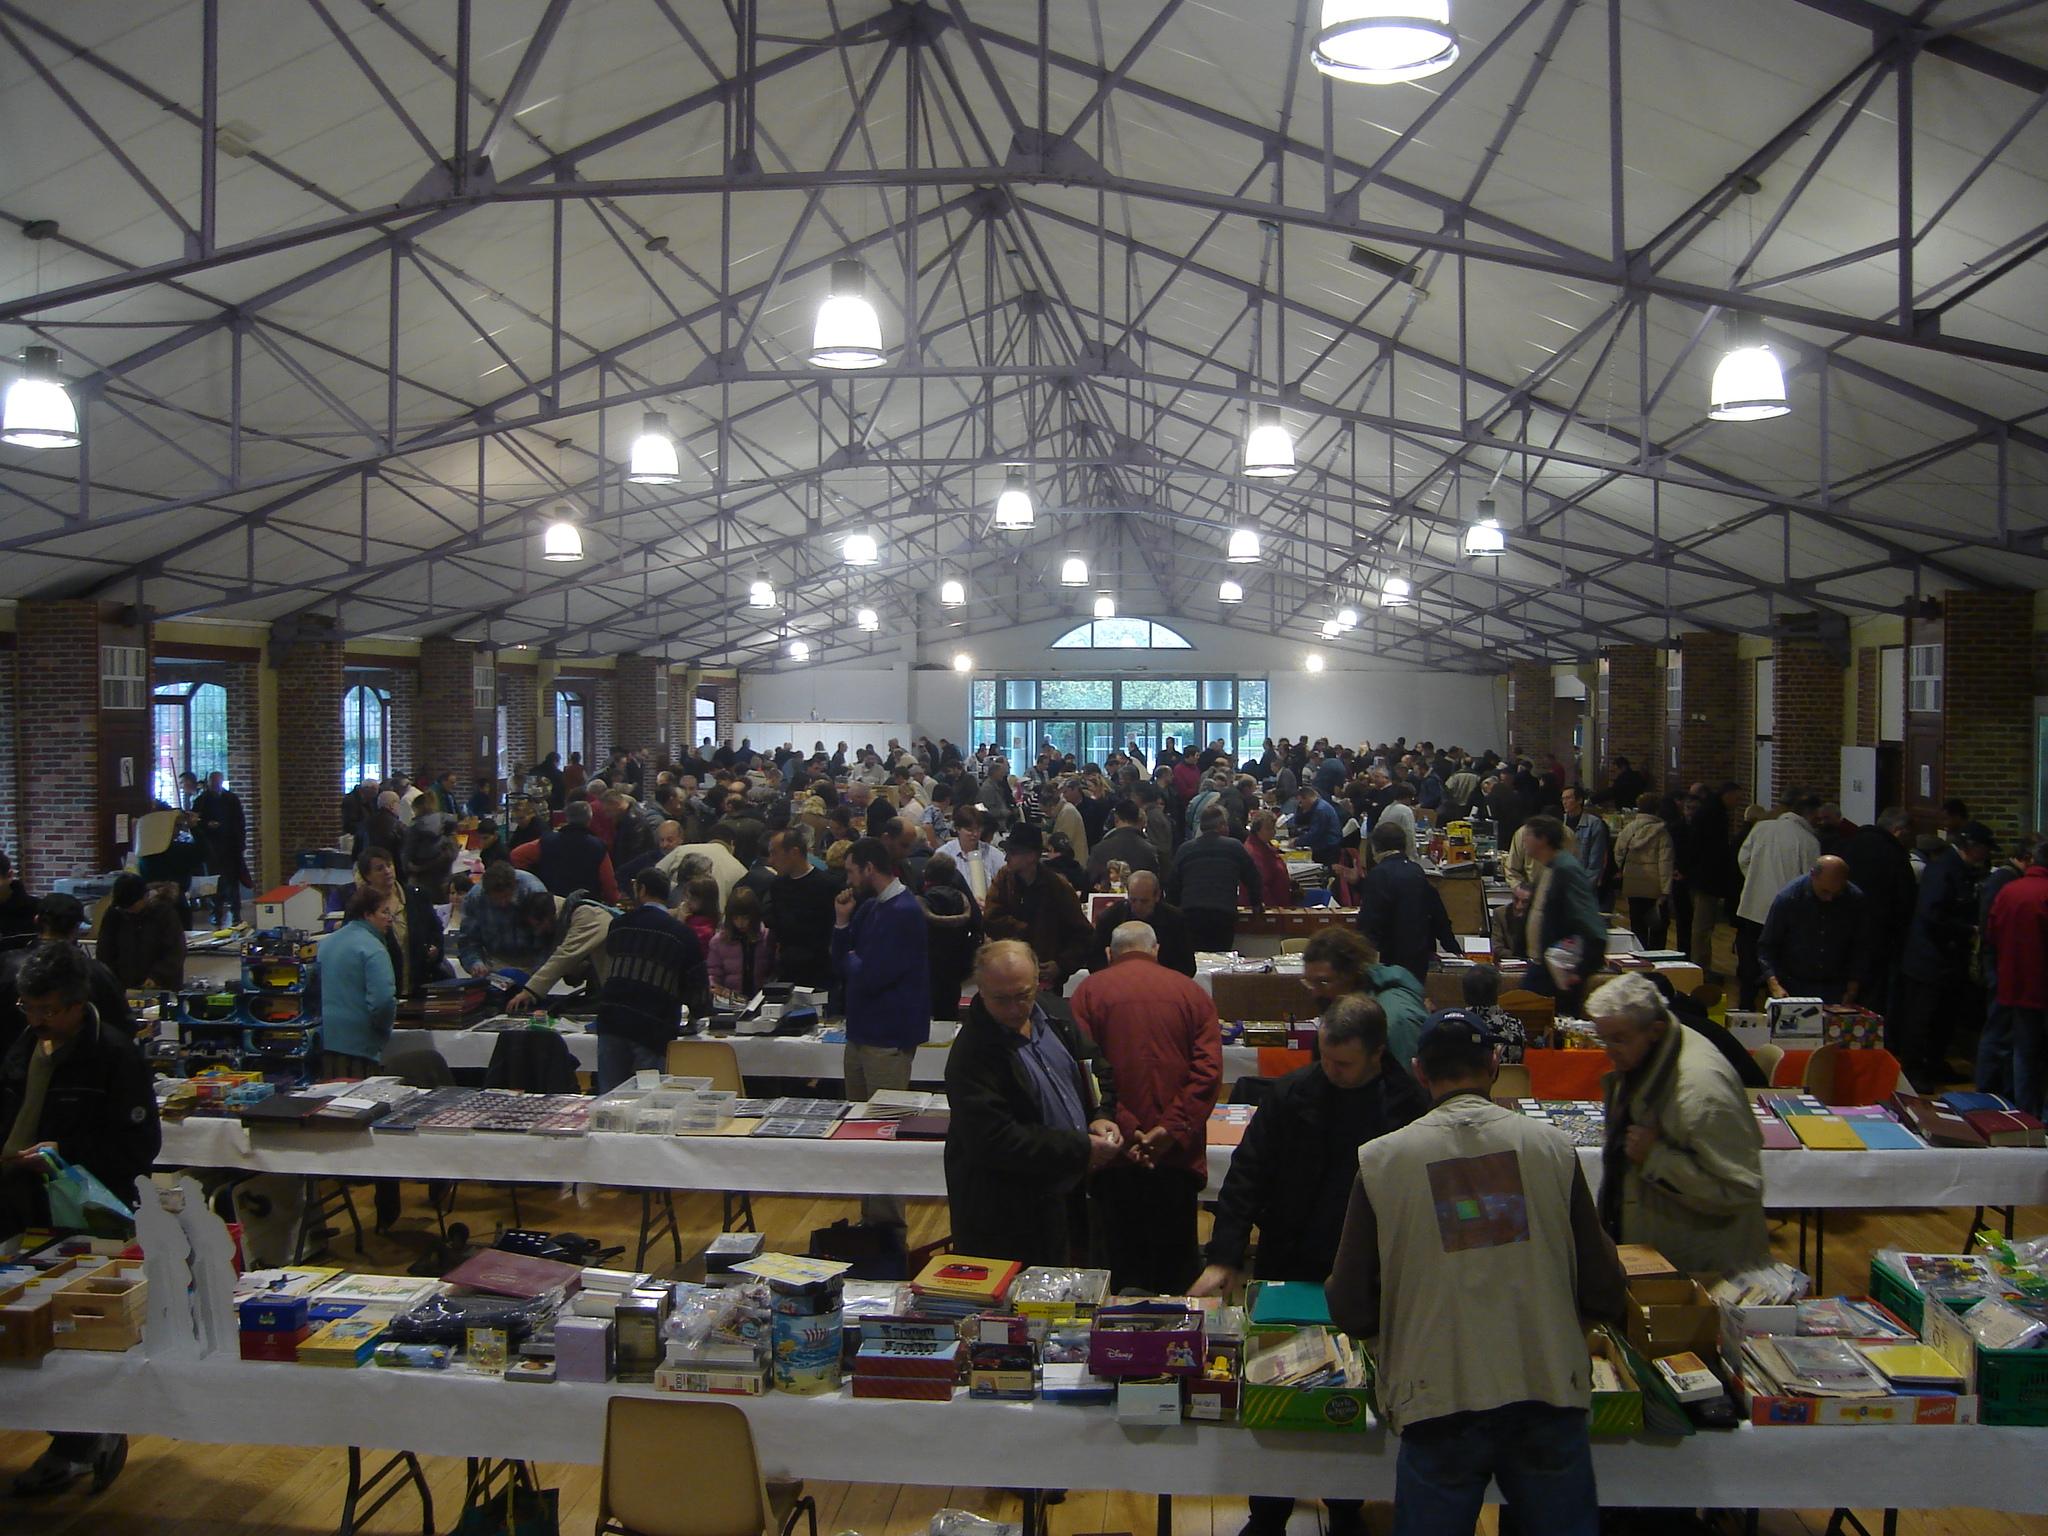 Bourse Multicollections - Mons en Baroeul - 13/11/16